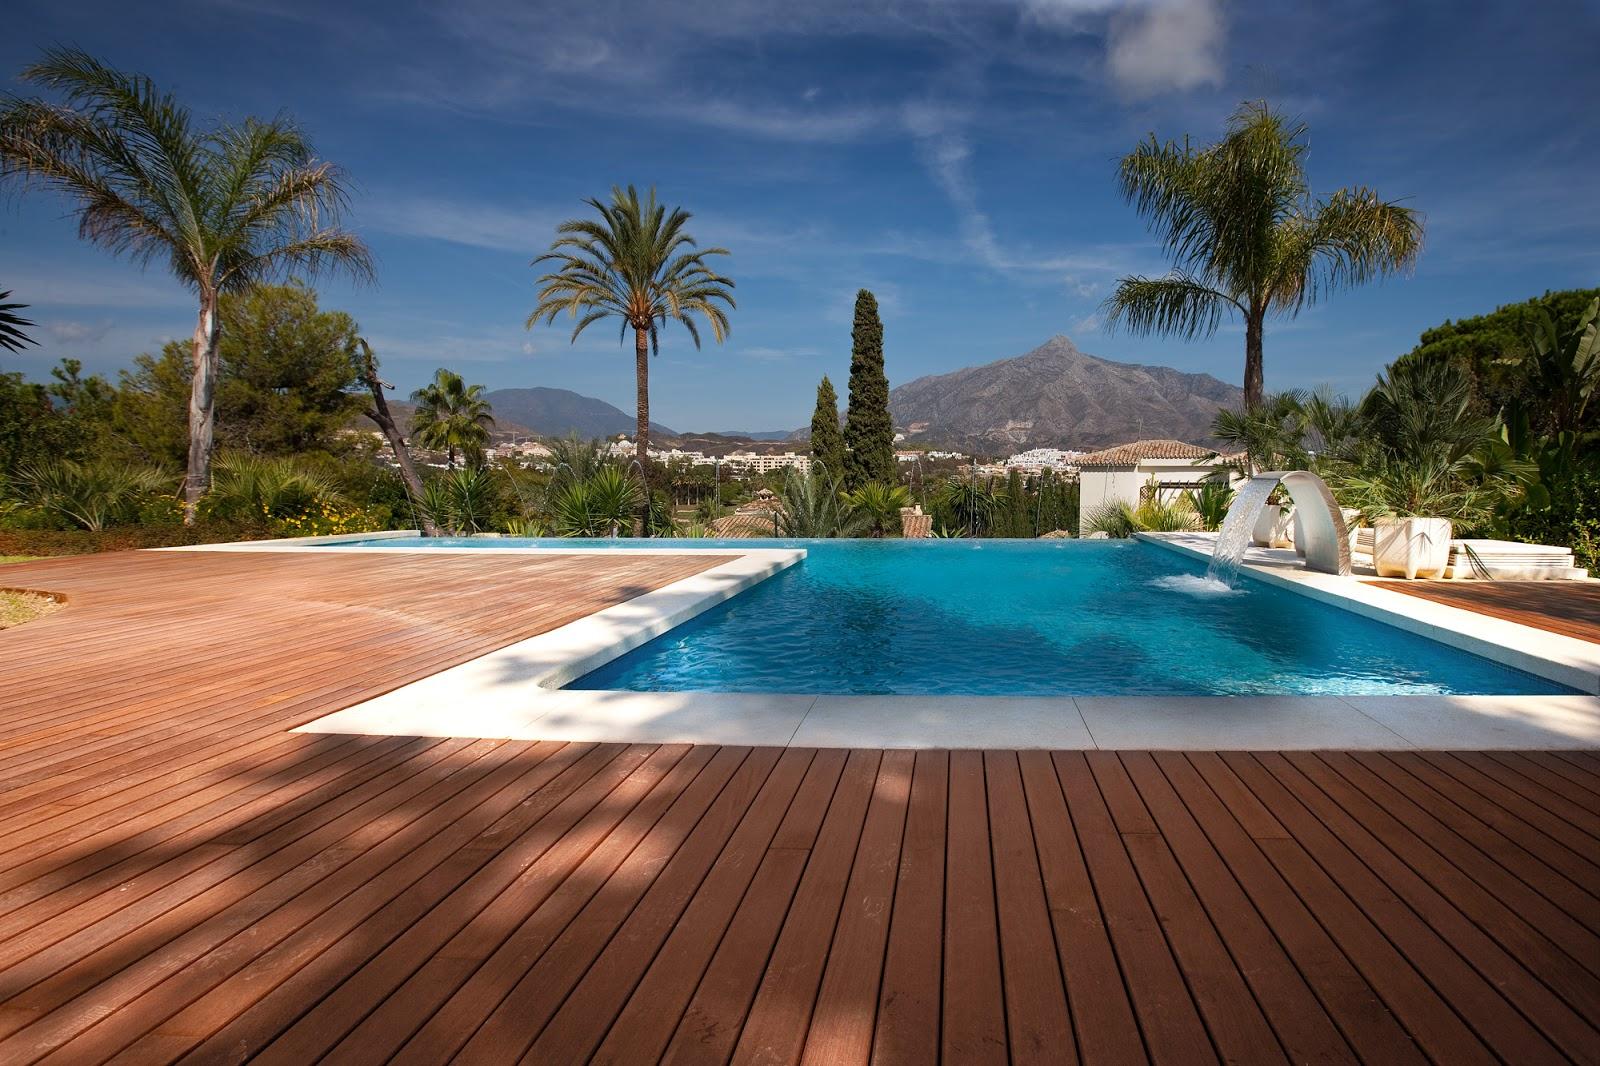 Poolside Villas For Sale On The Amelia Island Plantation